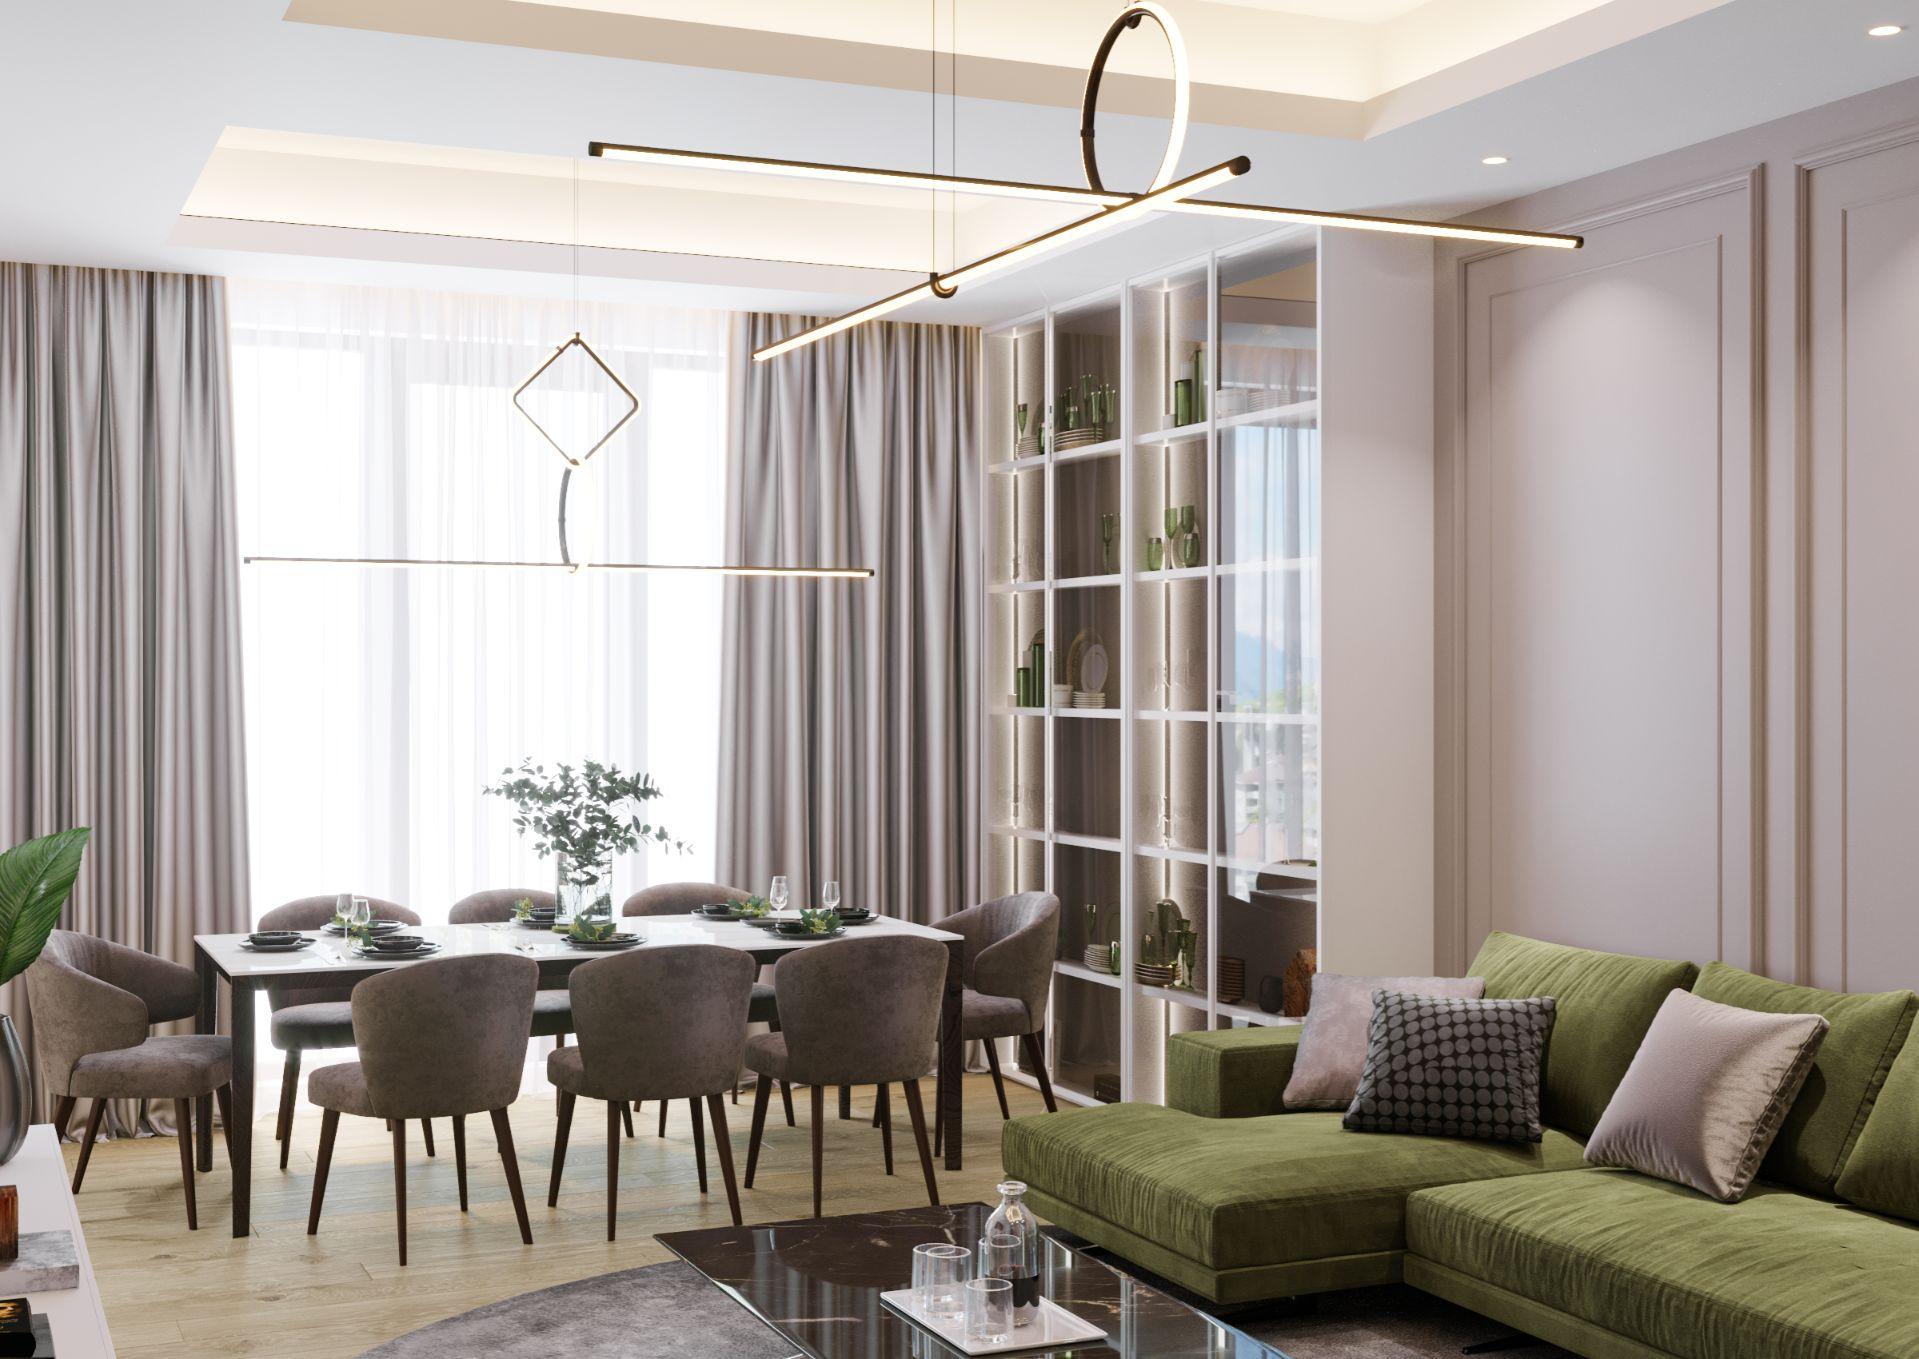 sufragerie proiectare interior